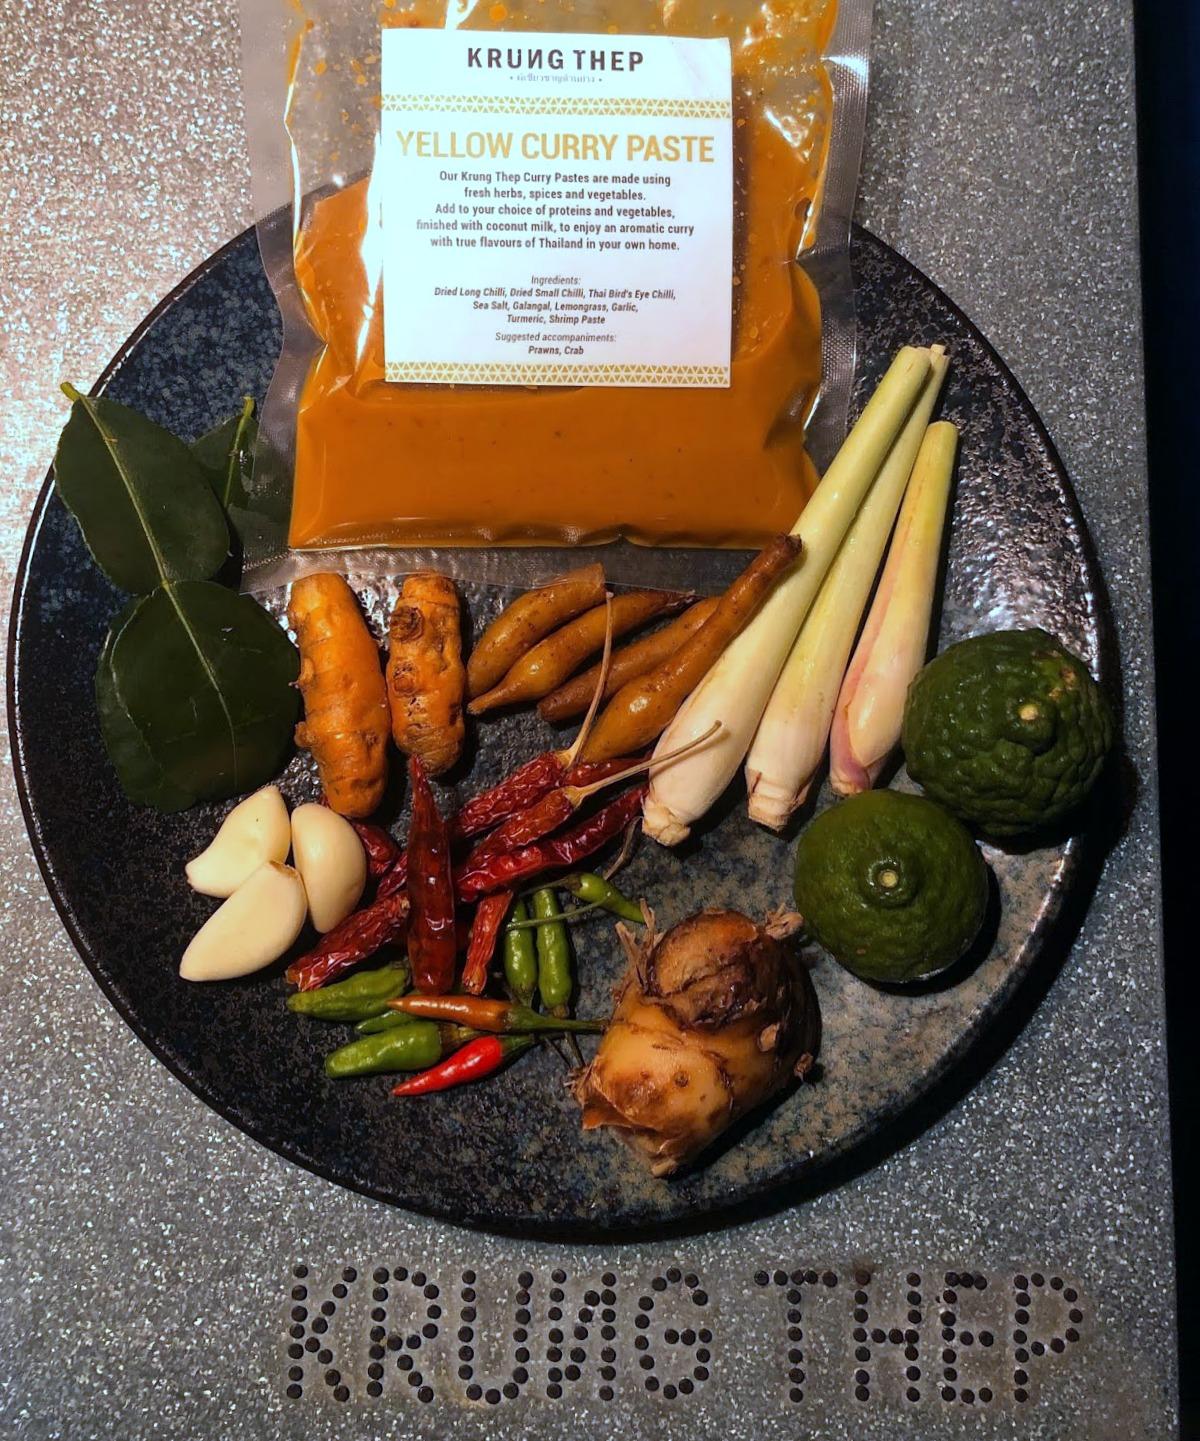 Krung Thep At Home: Classic Curry Pastes, Seductive Thai Sauces